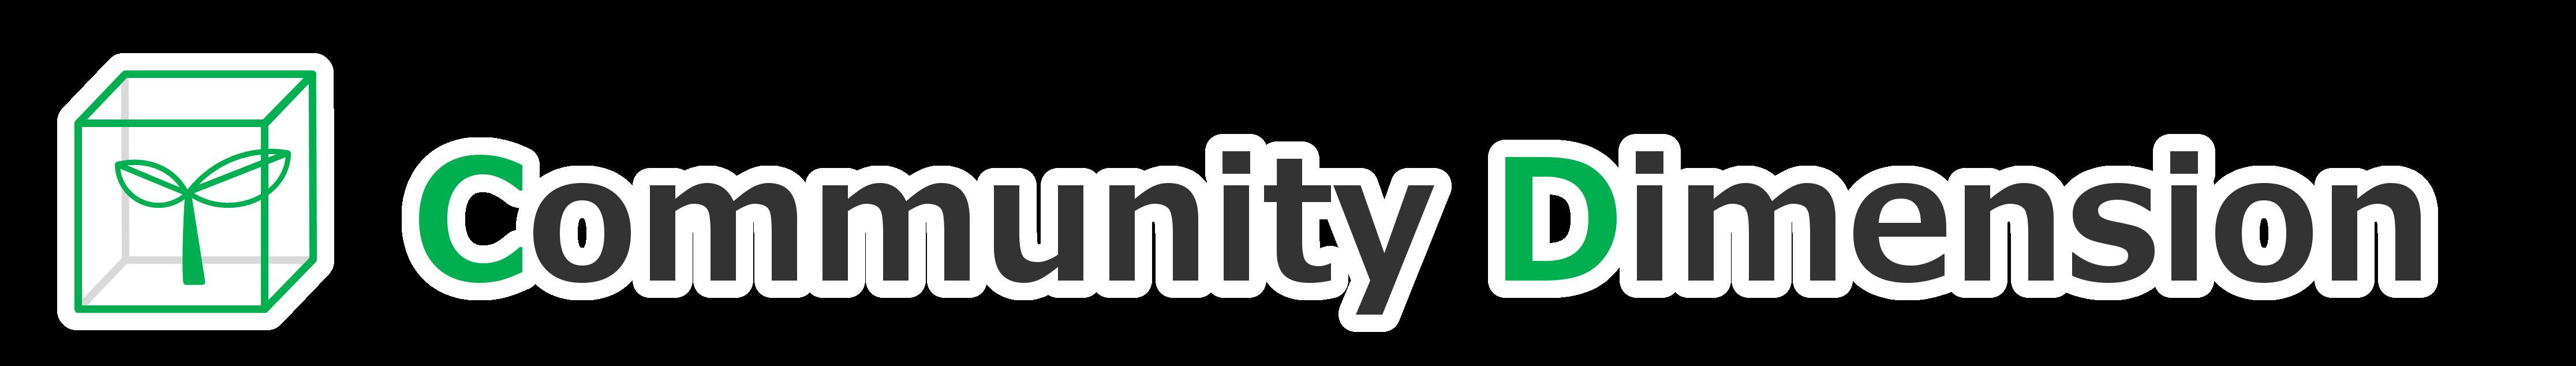 Community Dimension